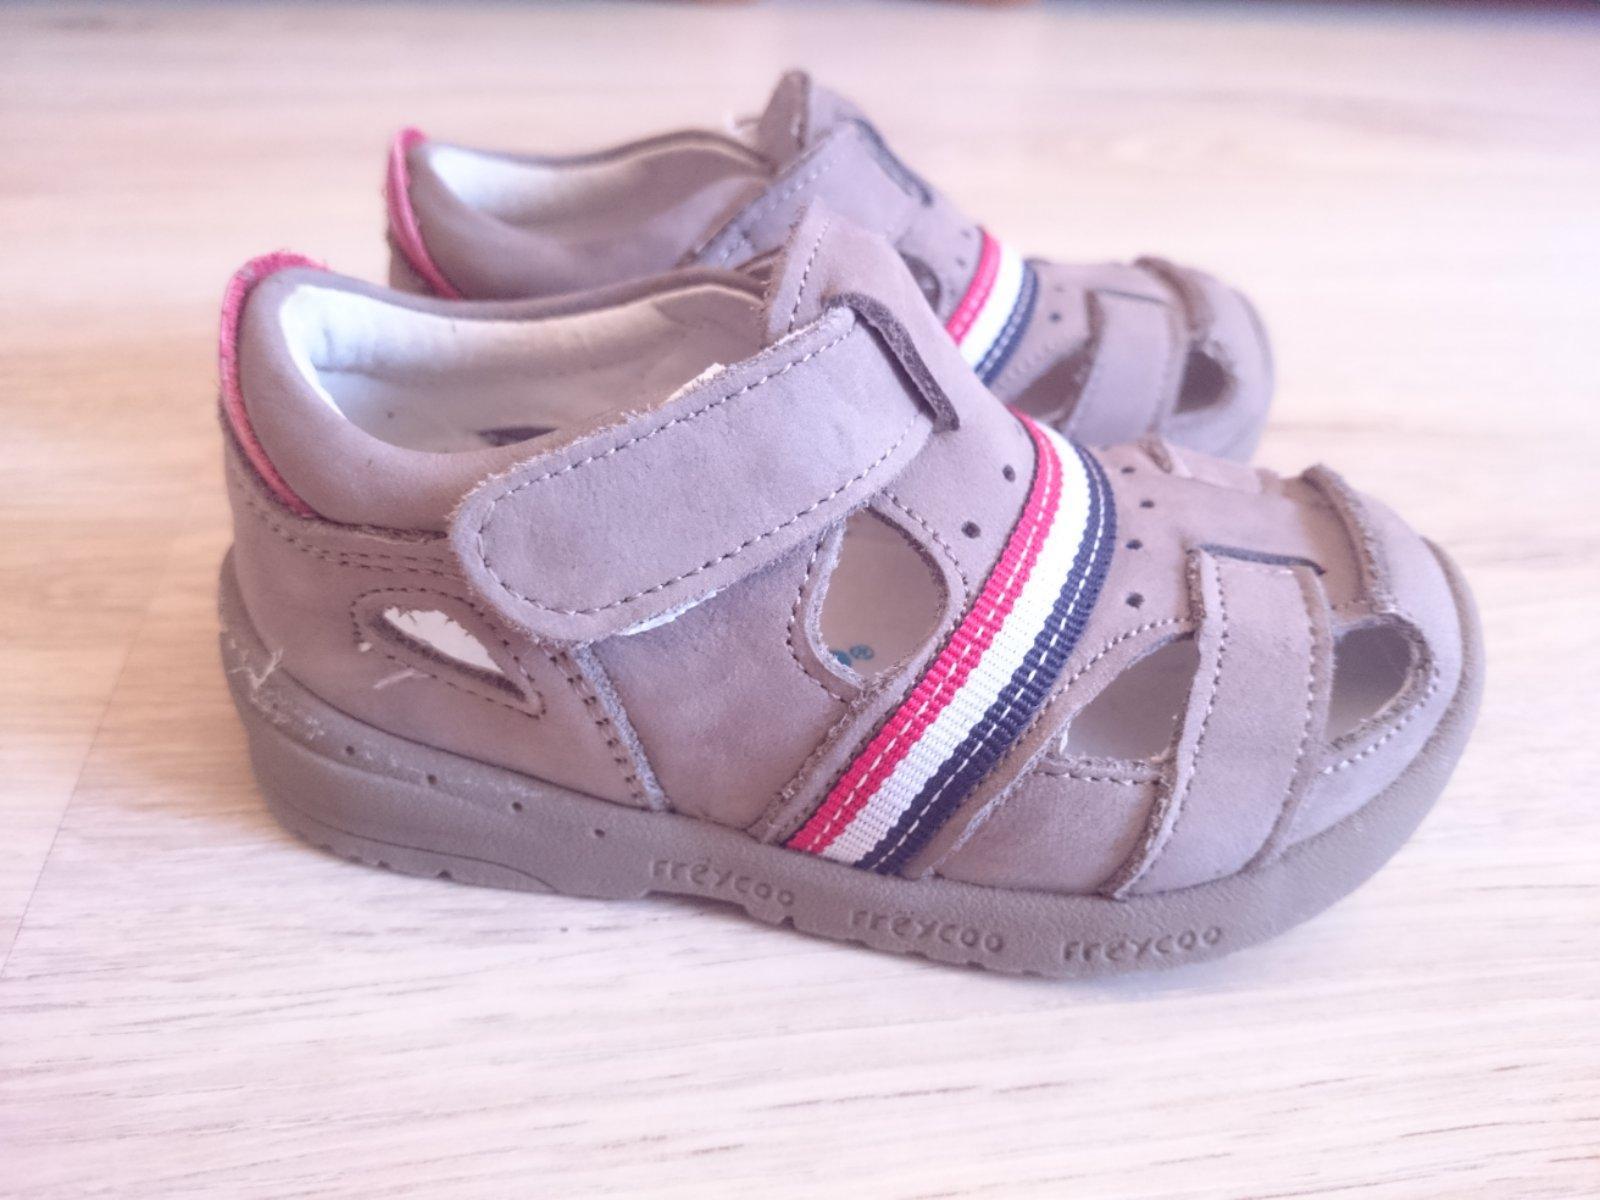 f7243fd4cfd8 Freycoo sandálky